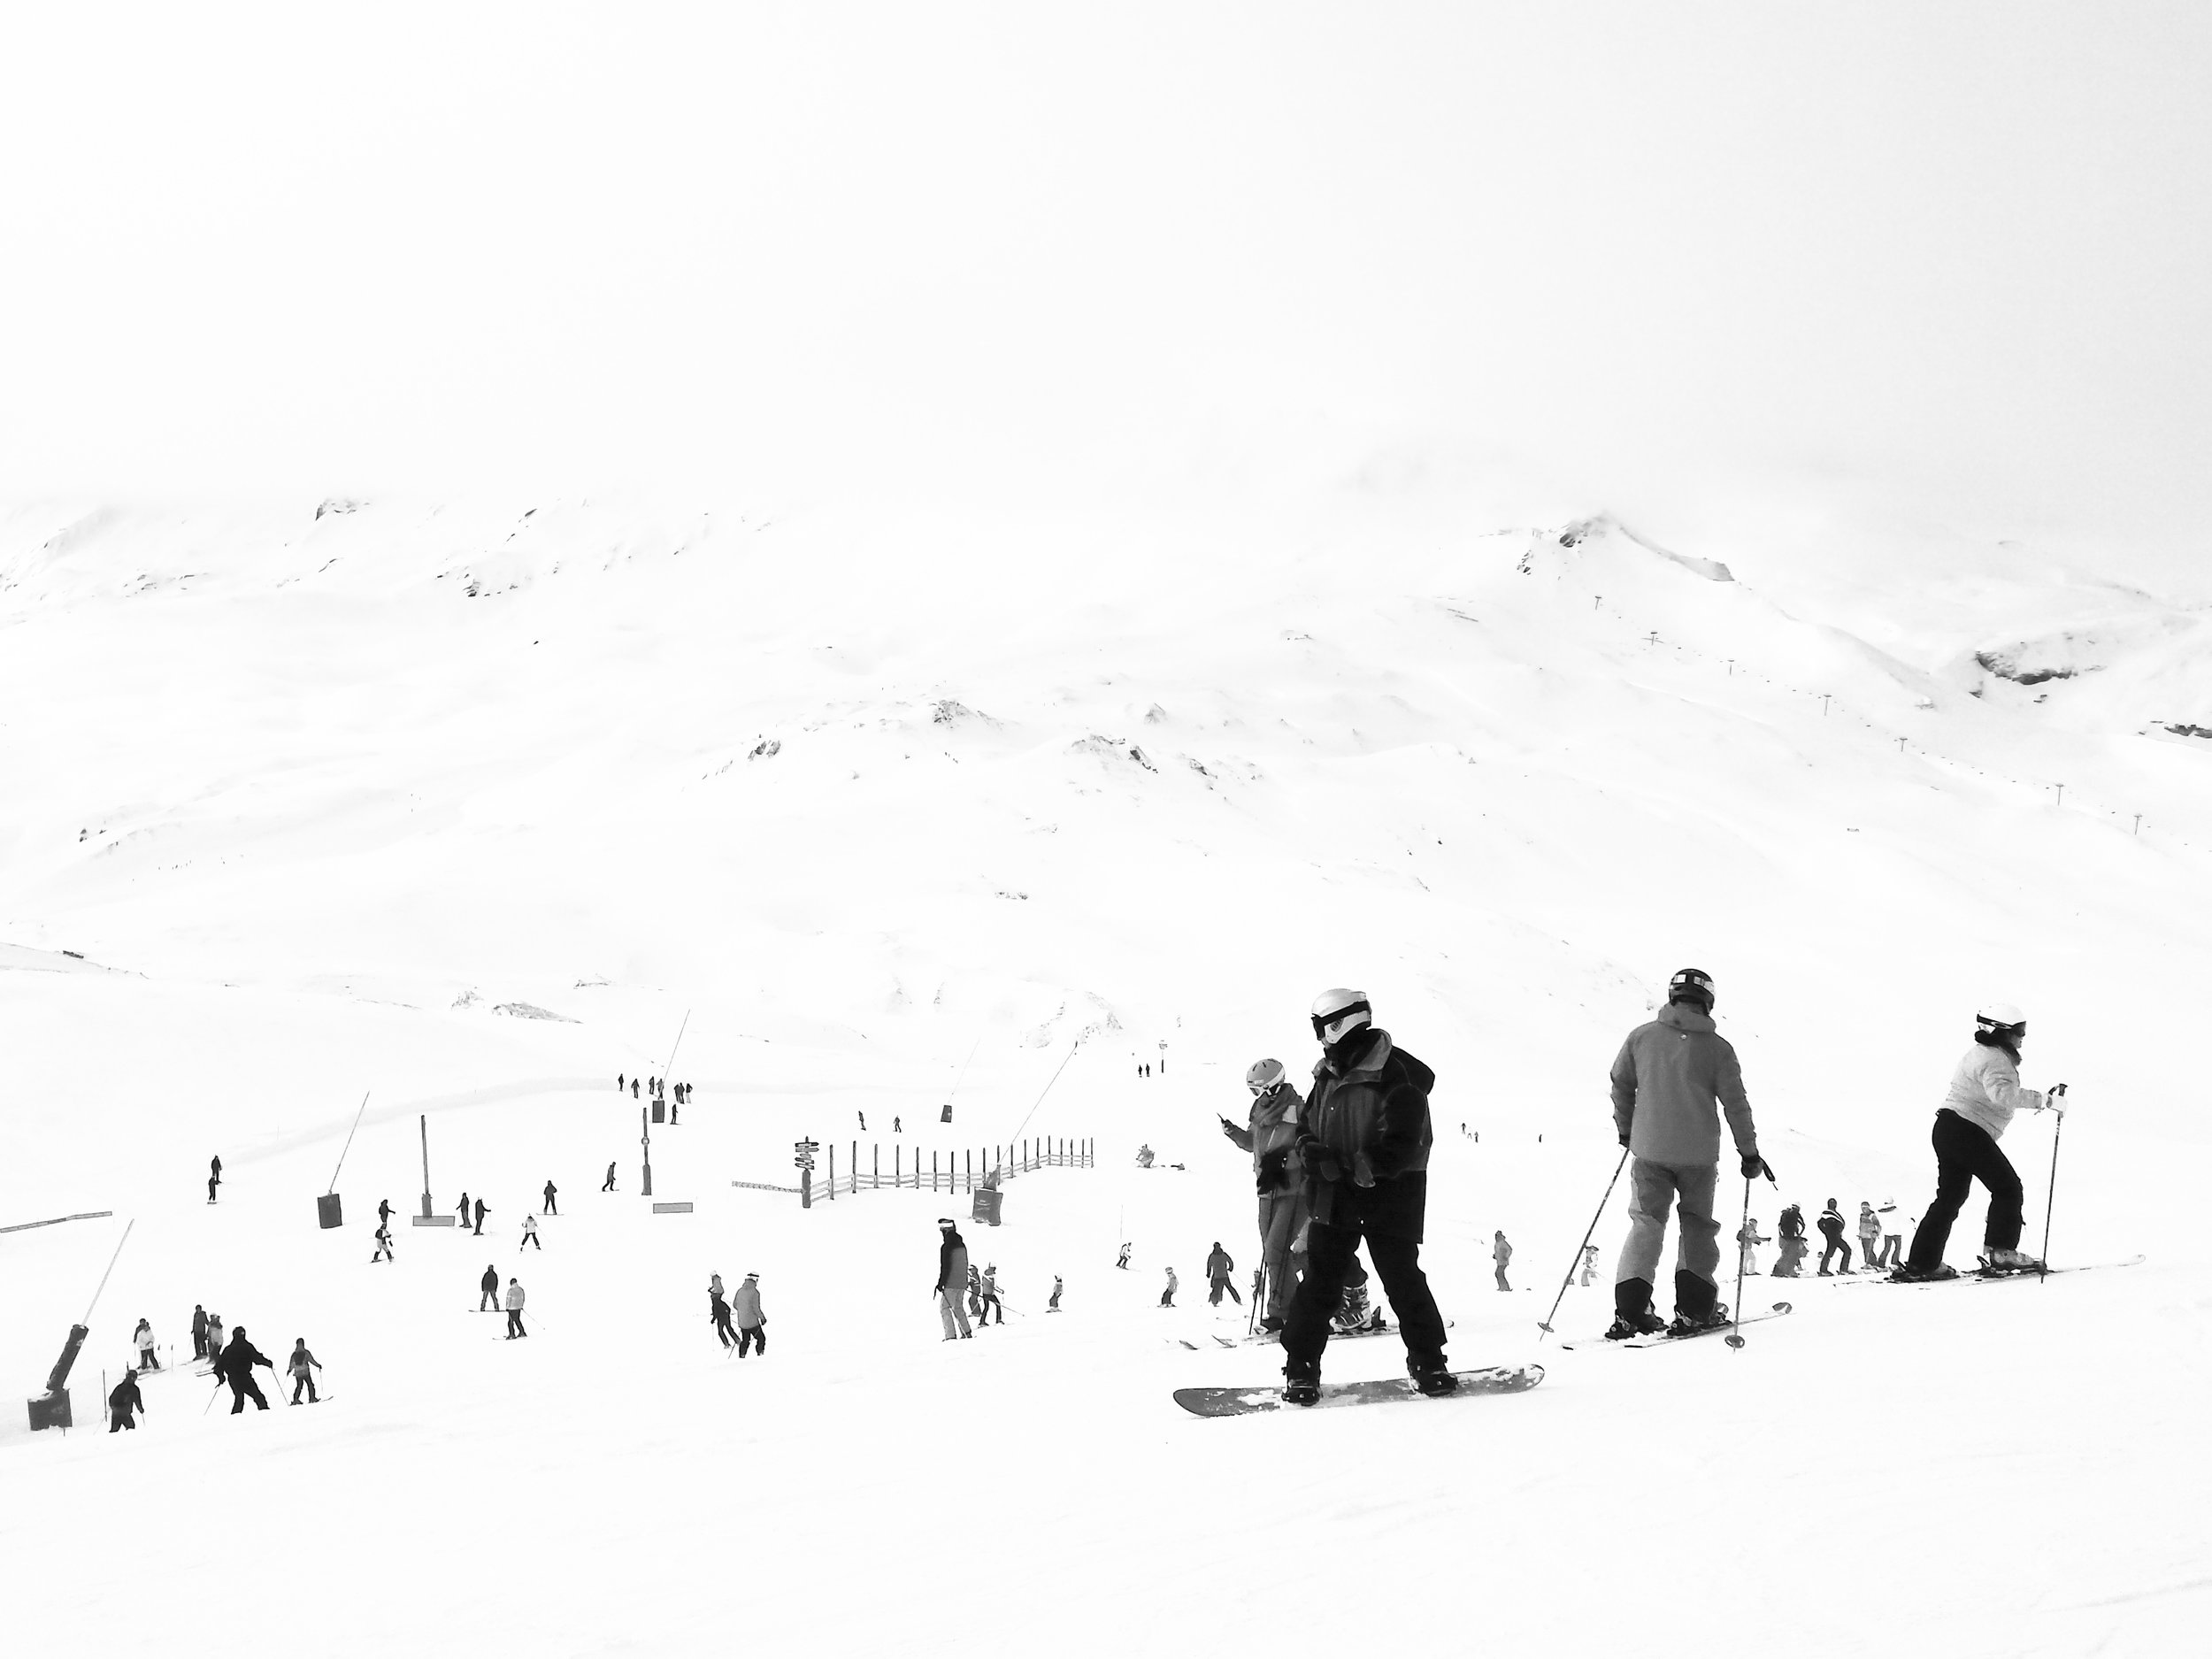 102036-val-d'Isère-snowboarding-ucpa.jpg